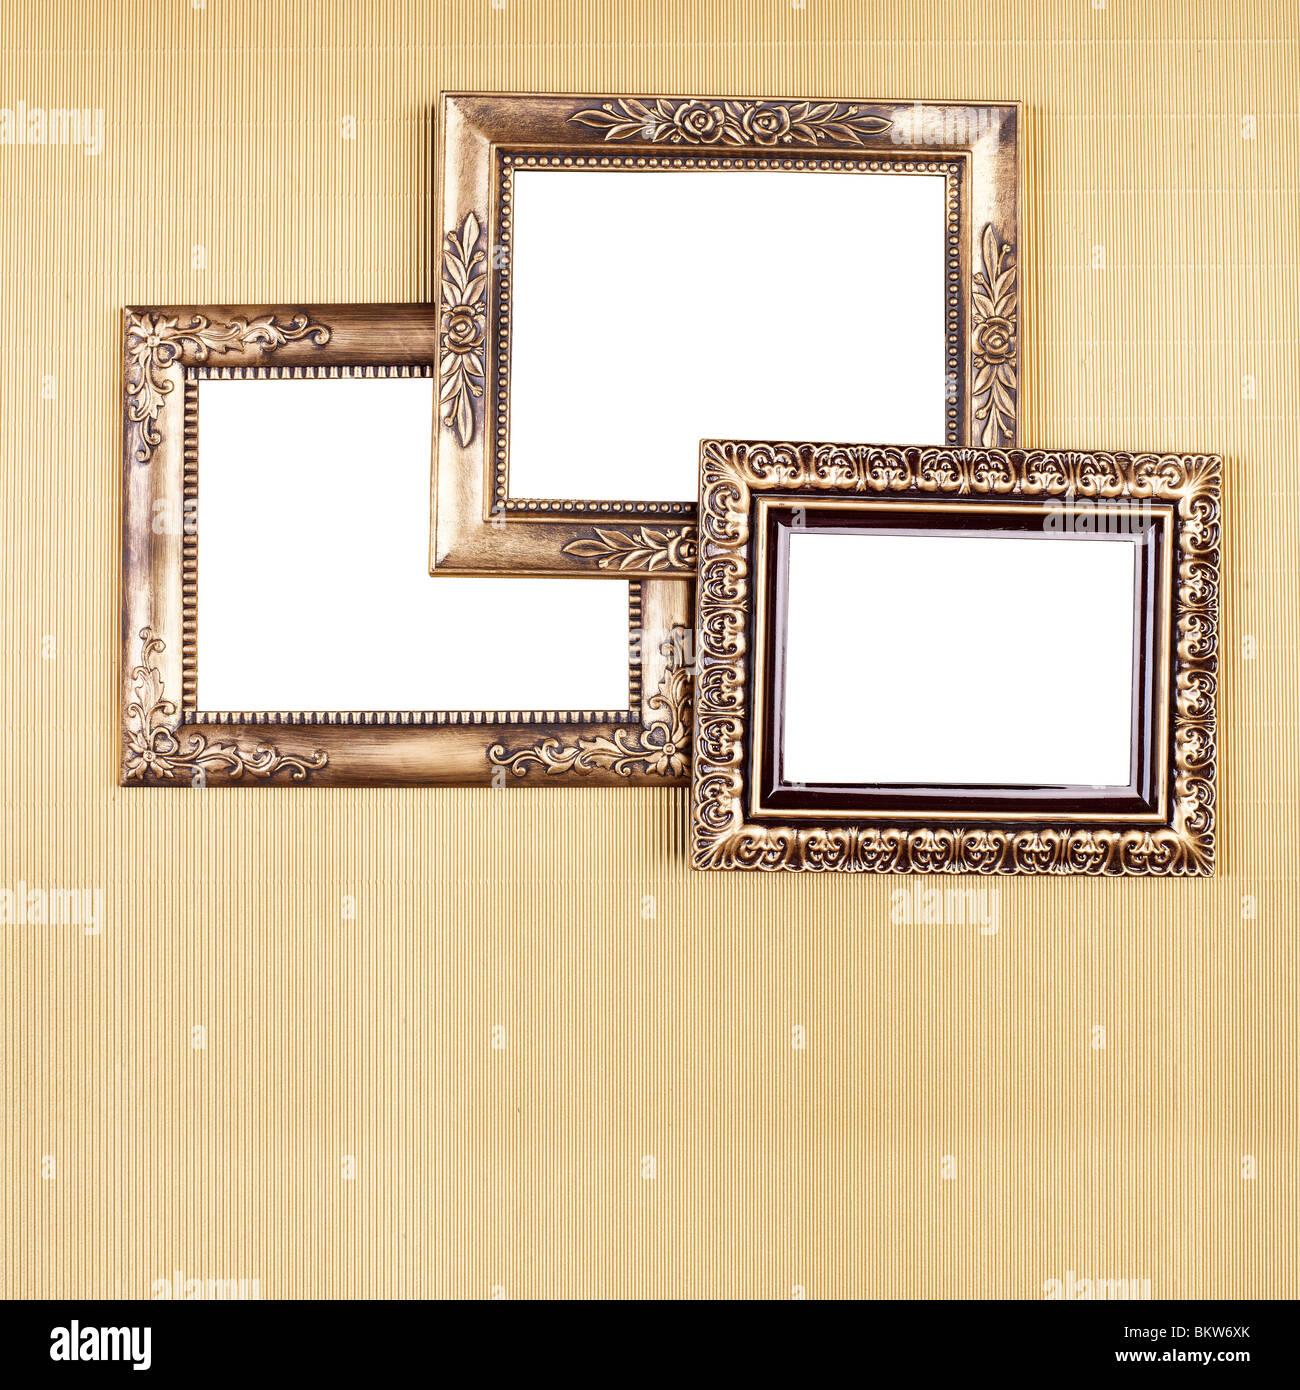 Drei alte Bilderrahmen auf Gold Muster, Design-Element Stockfoto ...